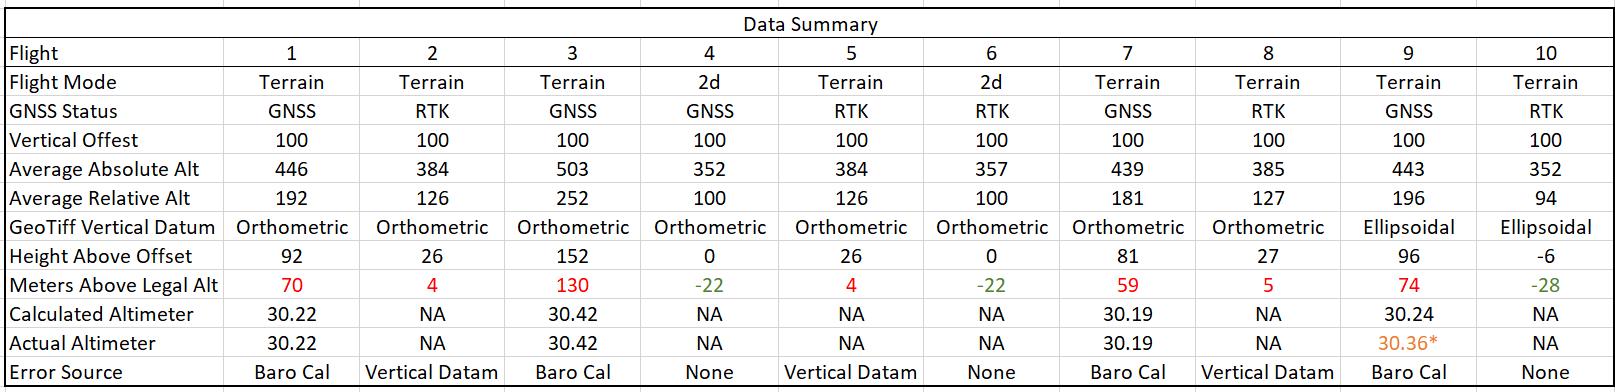 Data Summary Snip.PNG